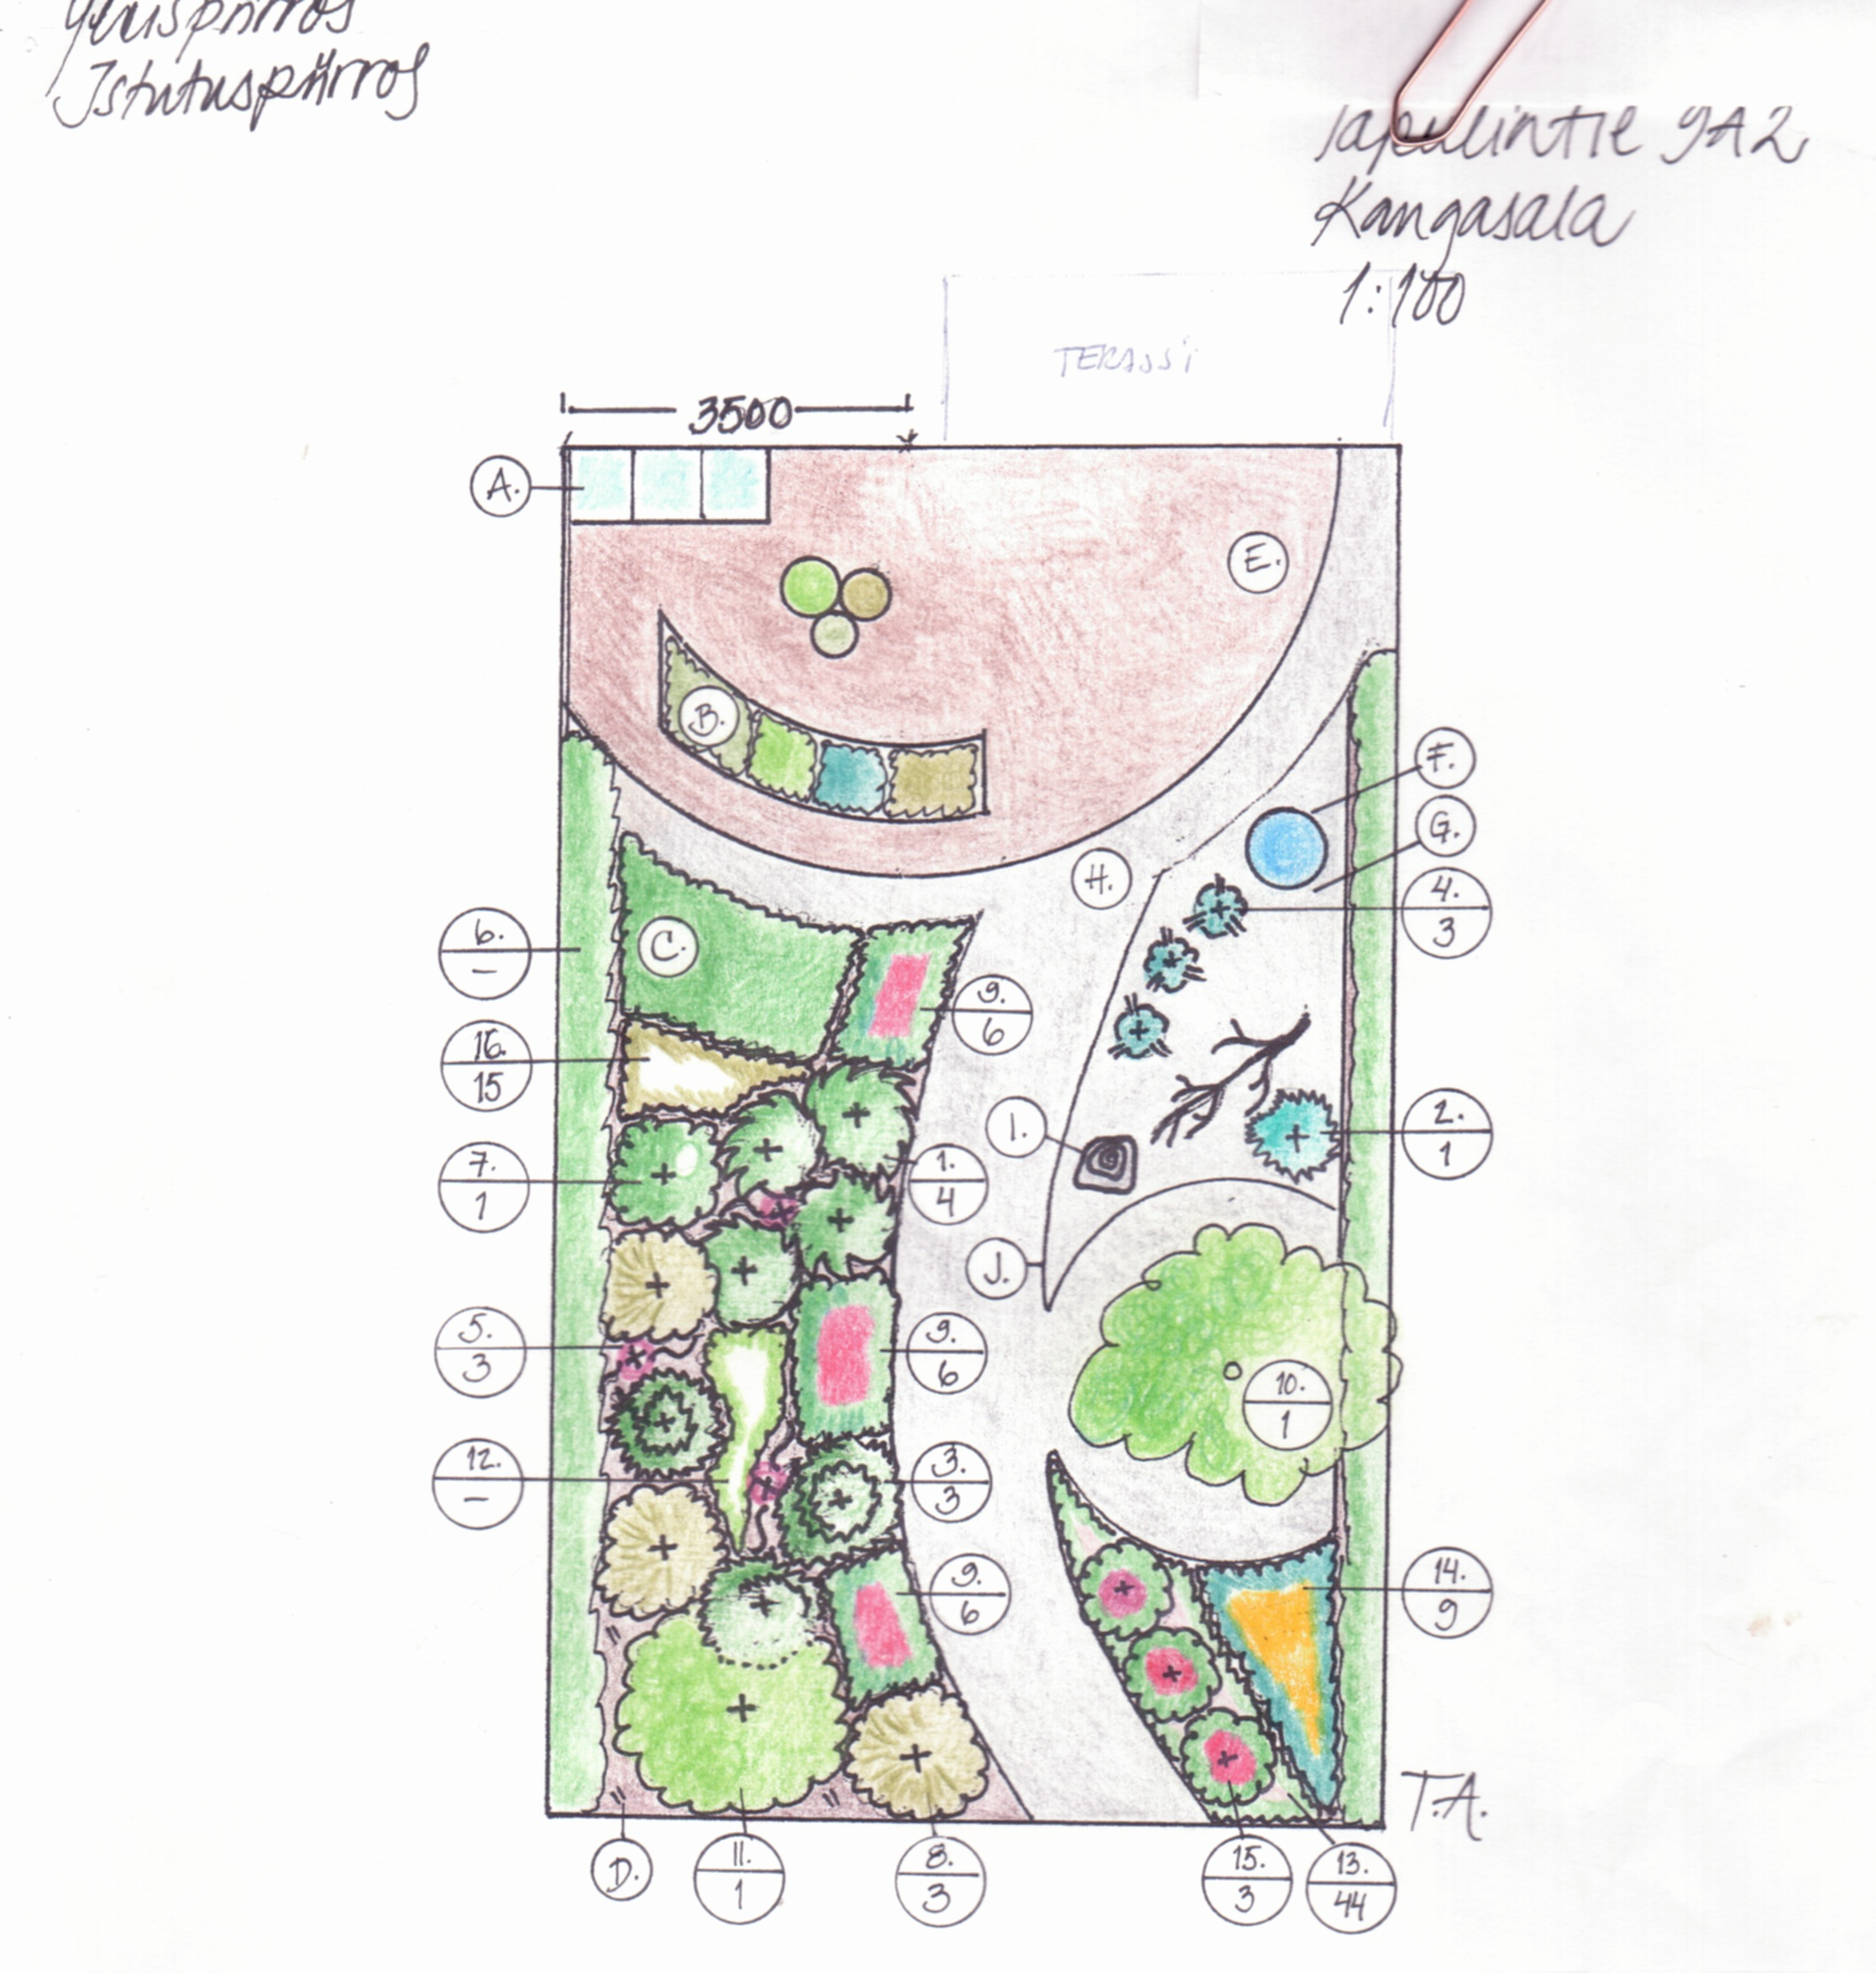 Puutarhasuunnitelma Istutuspiirros